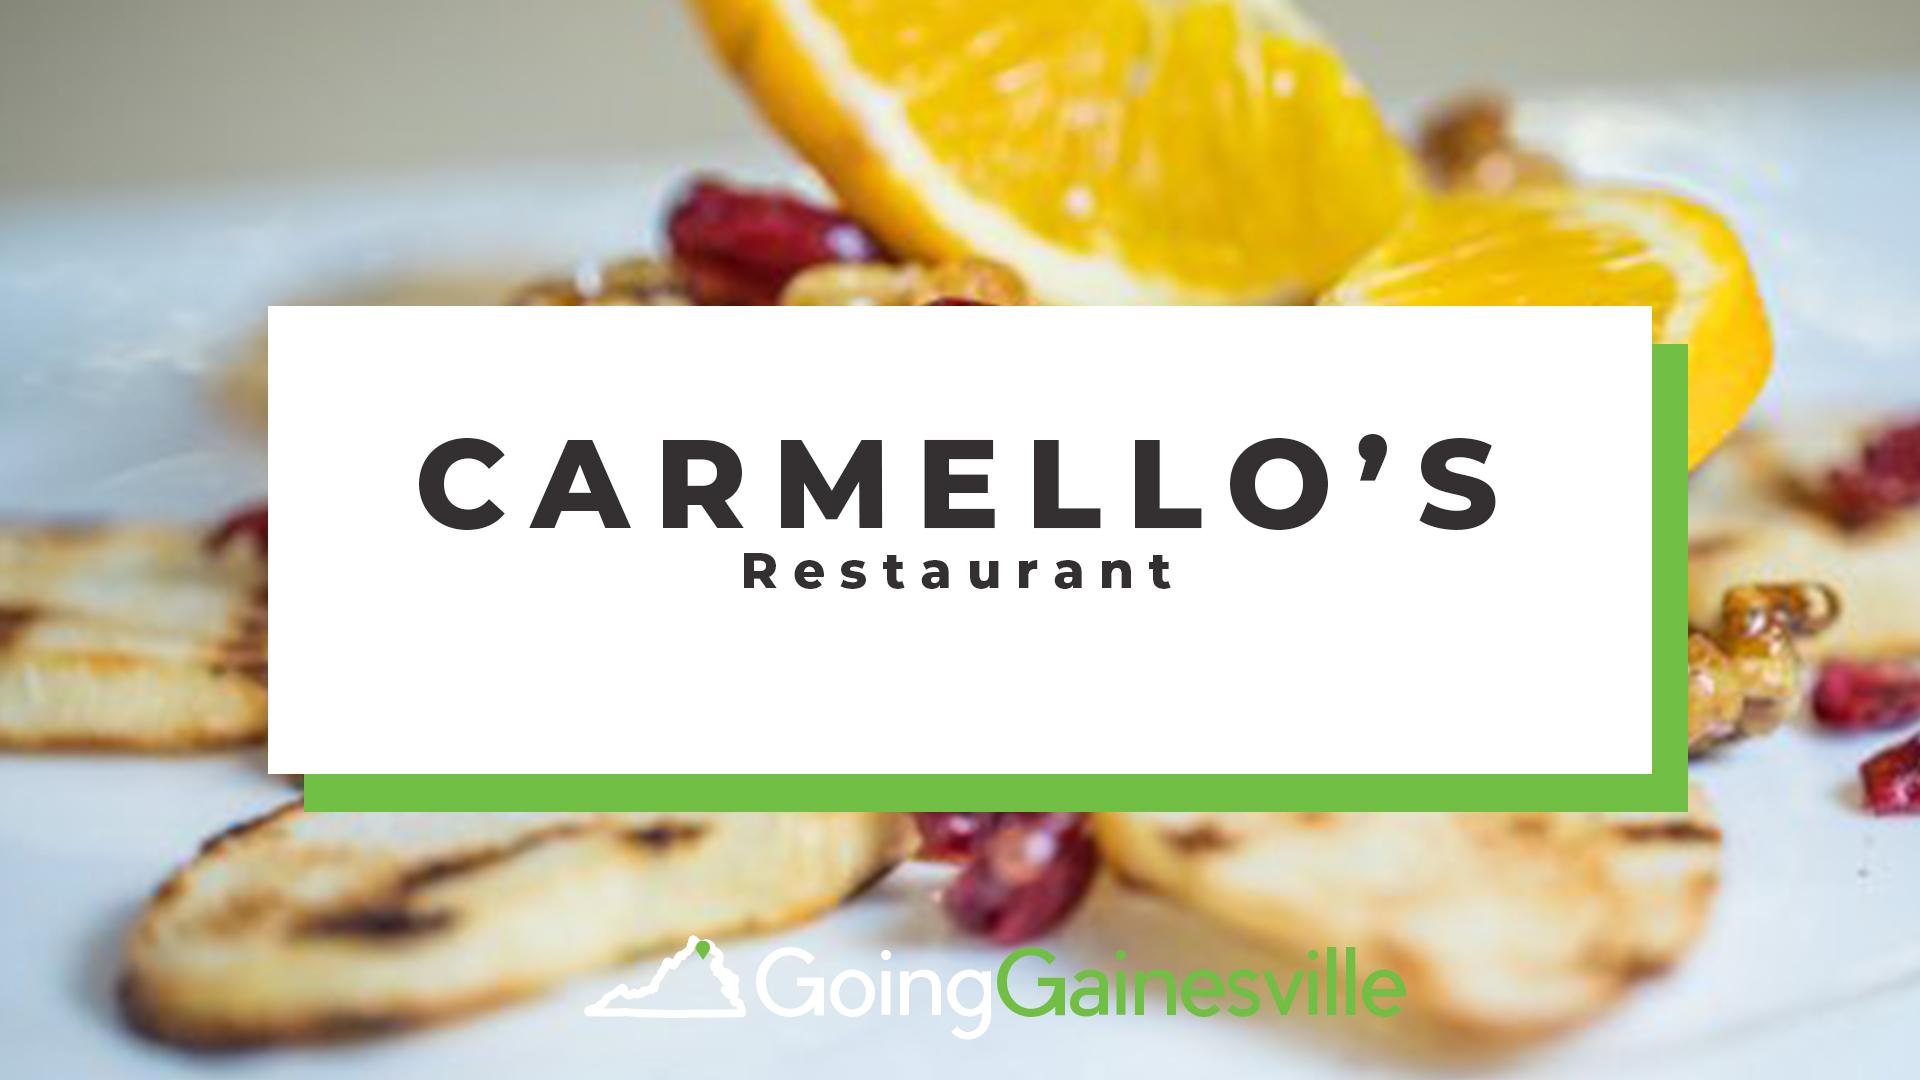 Carmello's